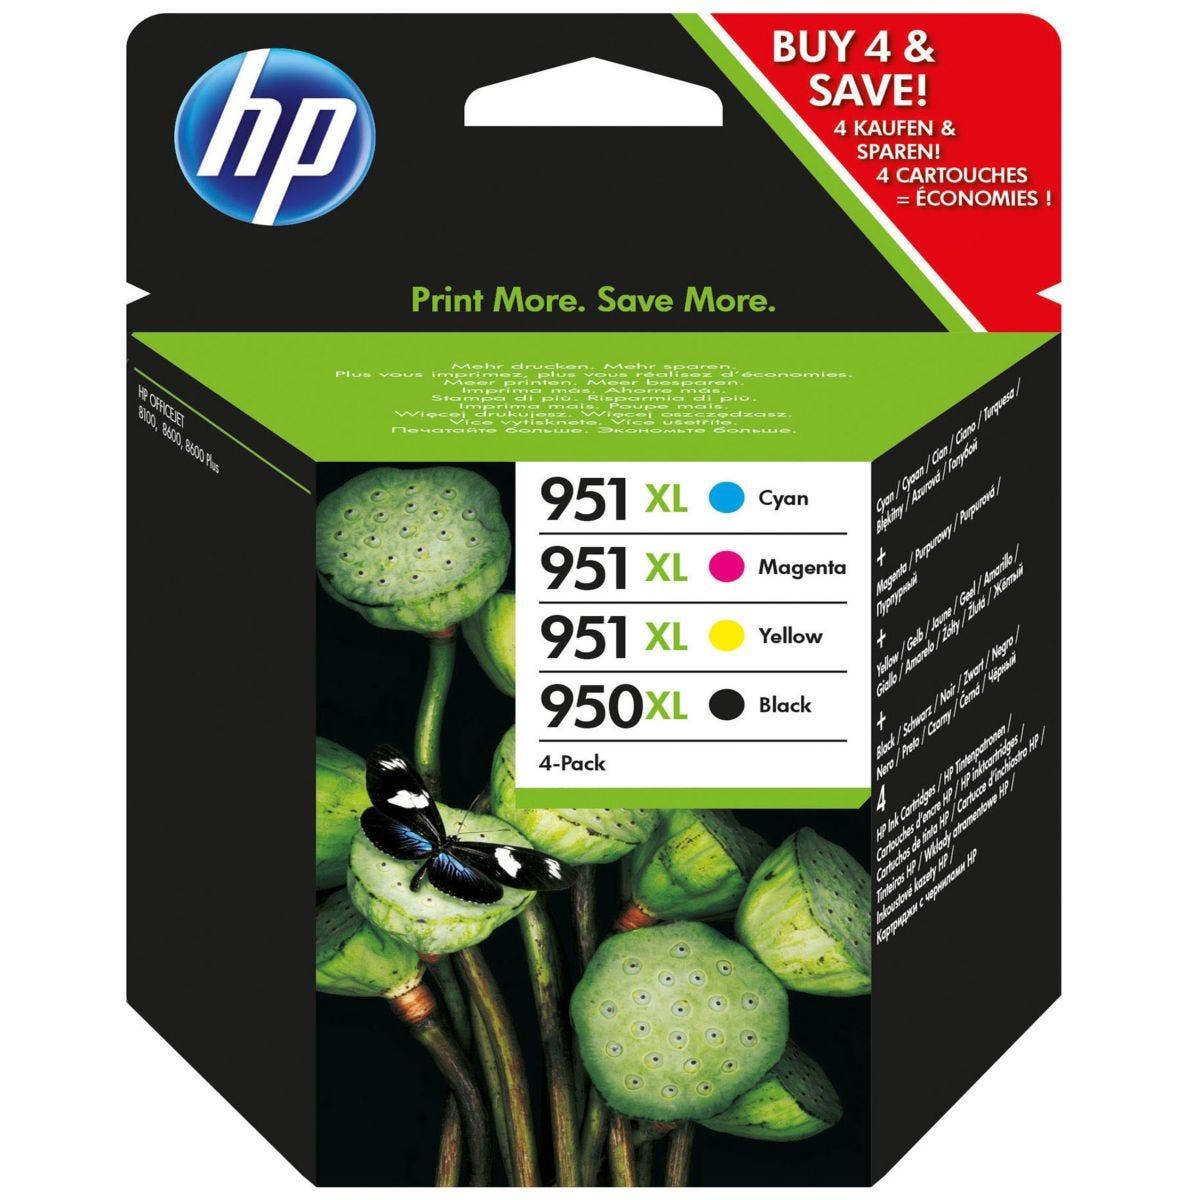 HP Hewlett-Packard 950/951XL C2P43AE Ink Cartridges - Combo Pack